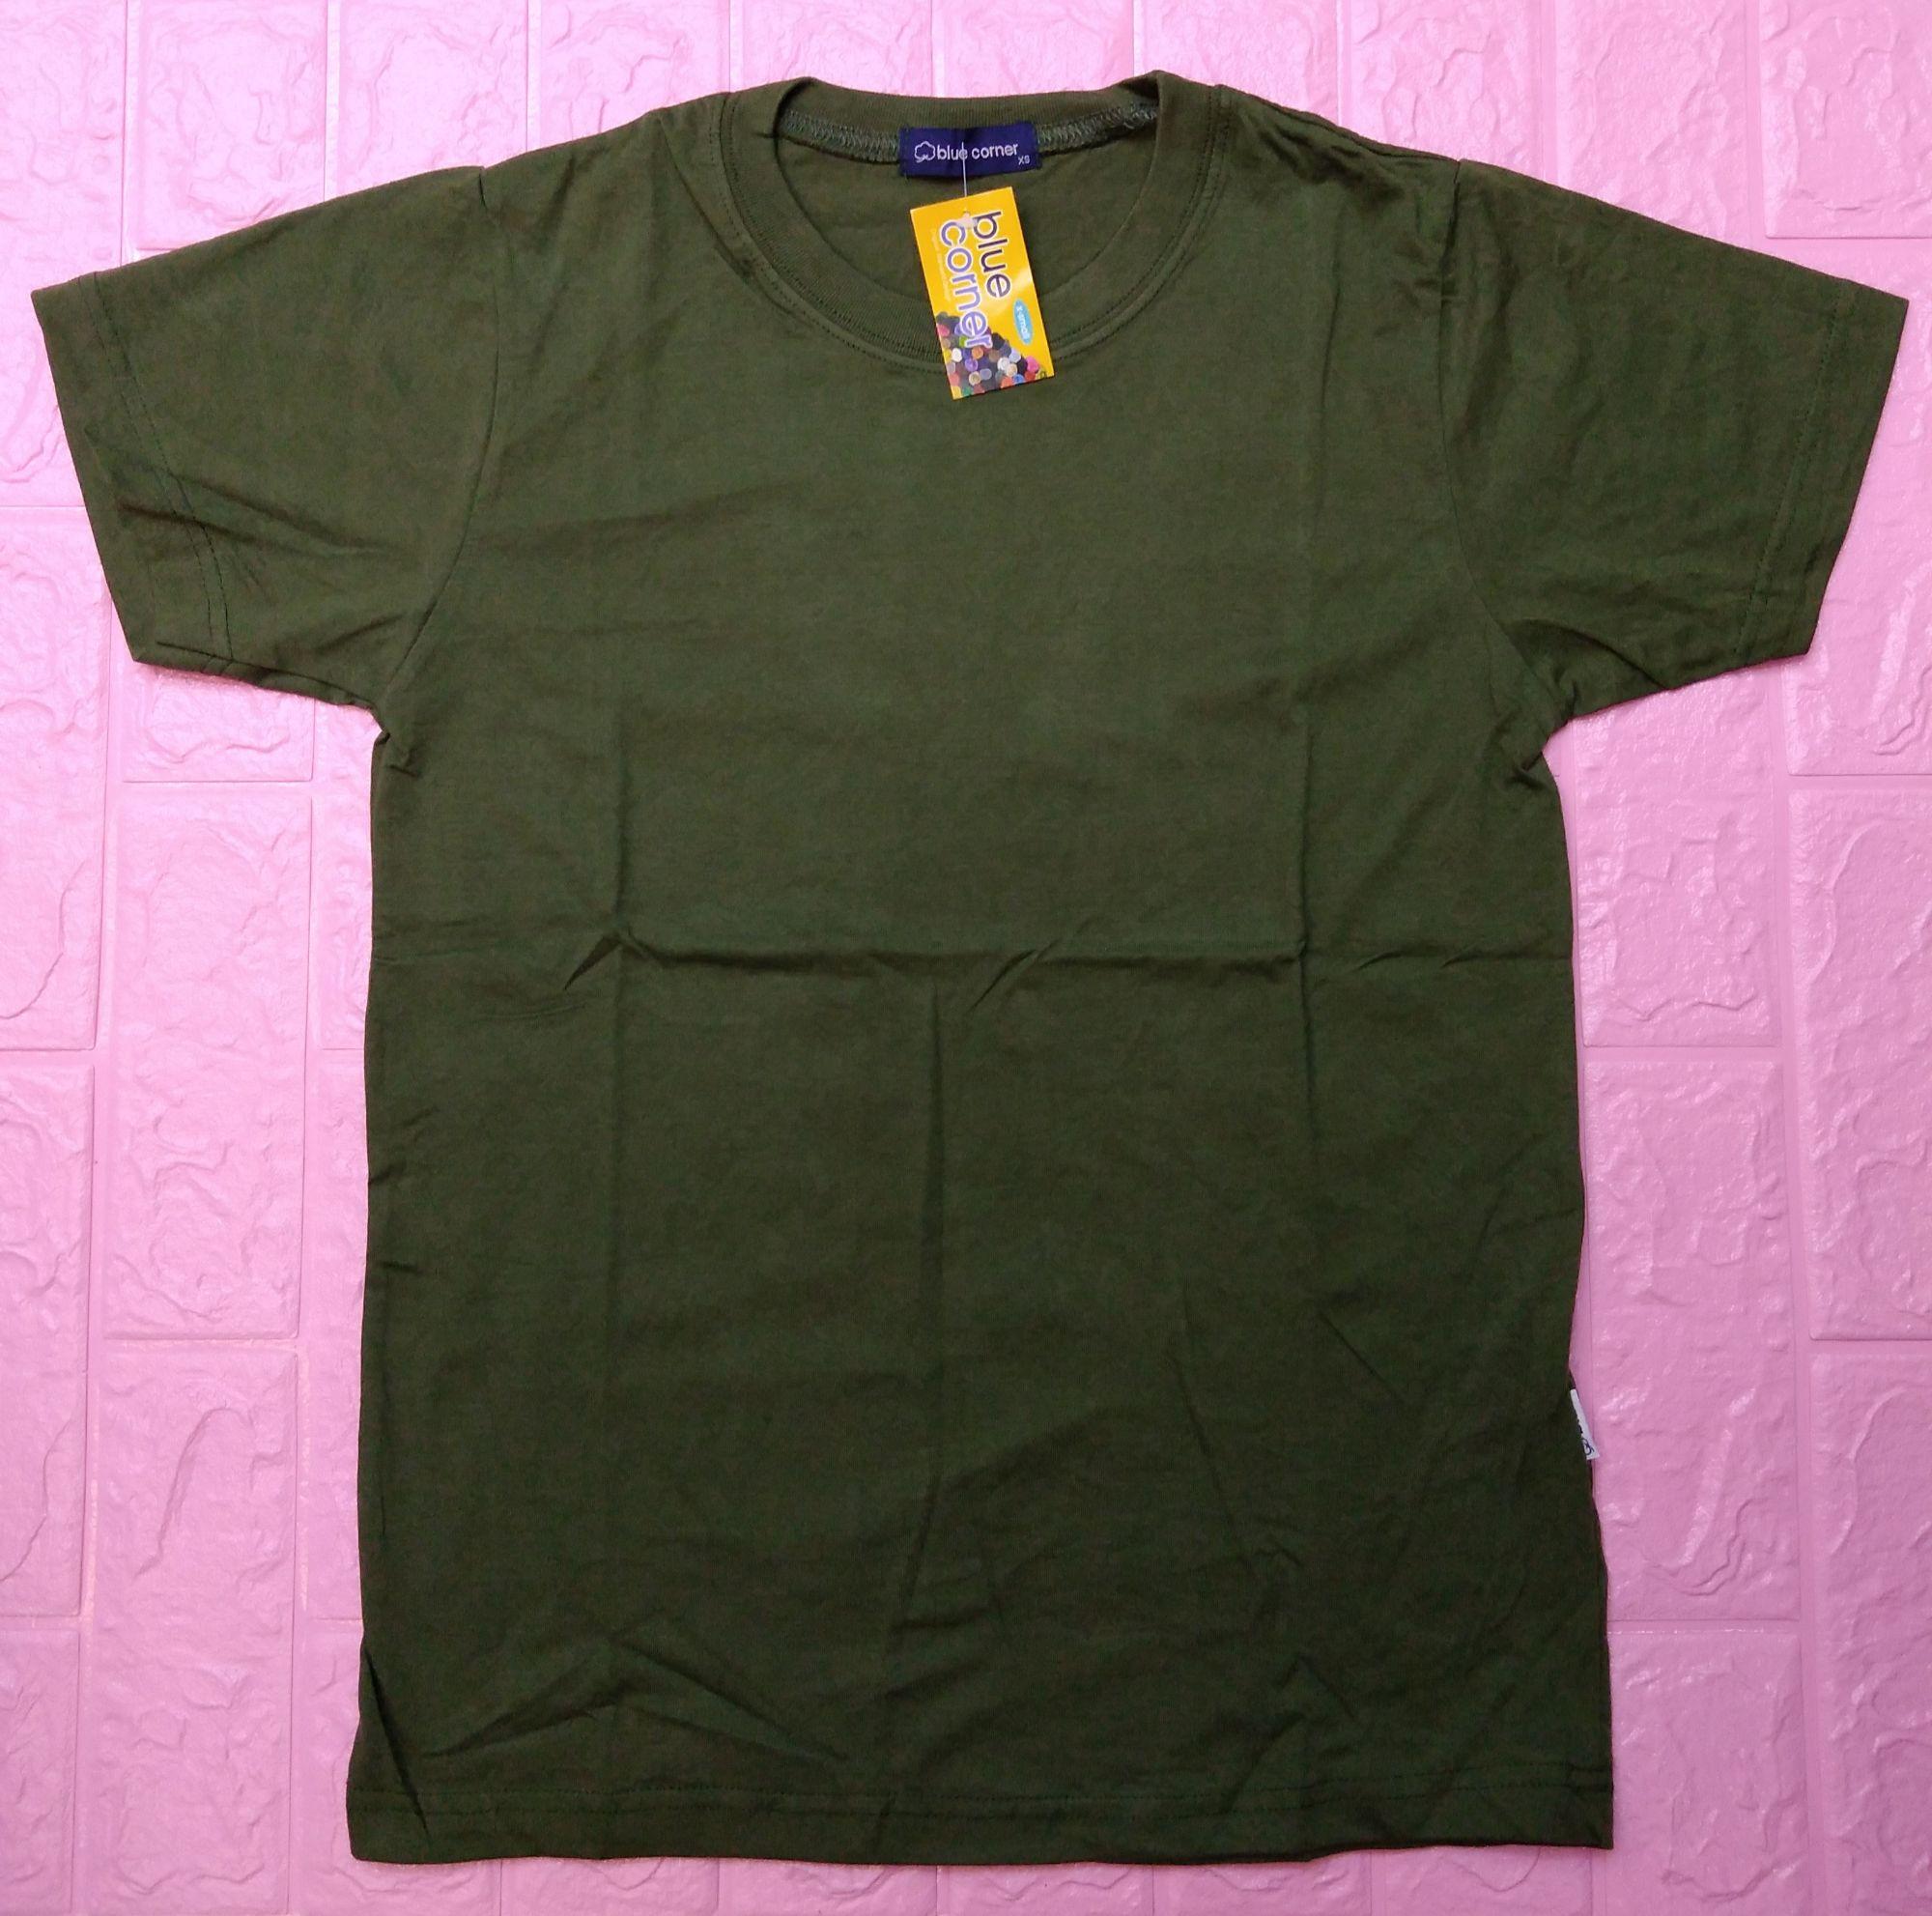 Blue Corner Army Green T Shirt Round Neck For Unisex Lazada Ph